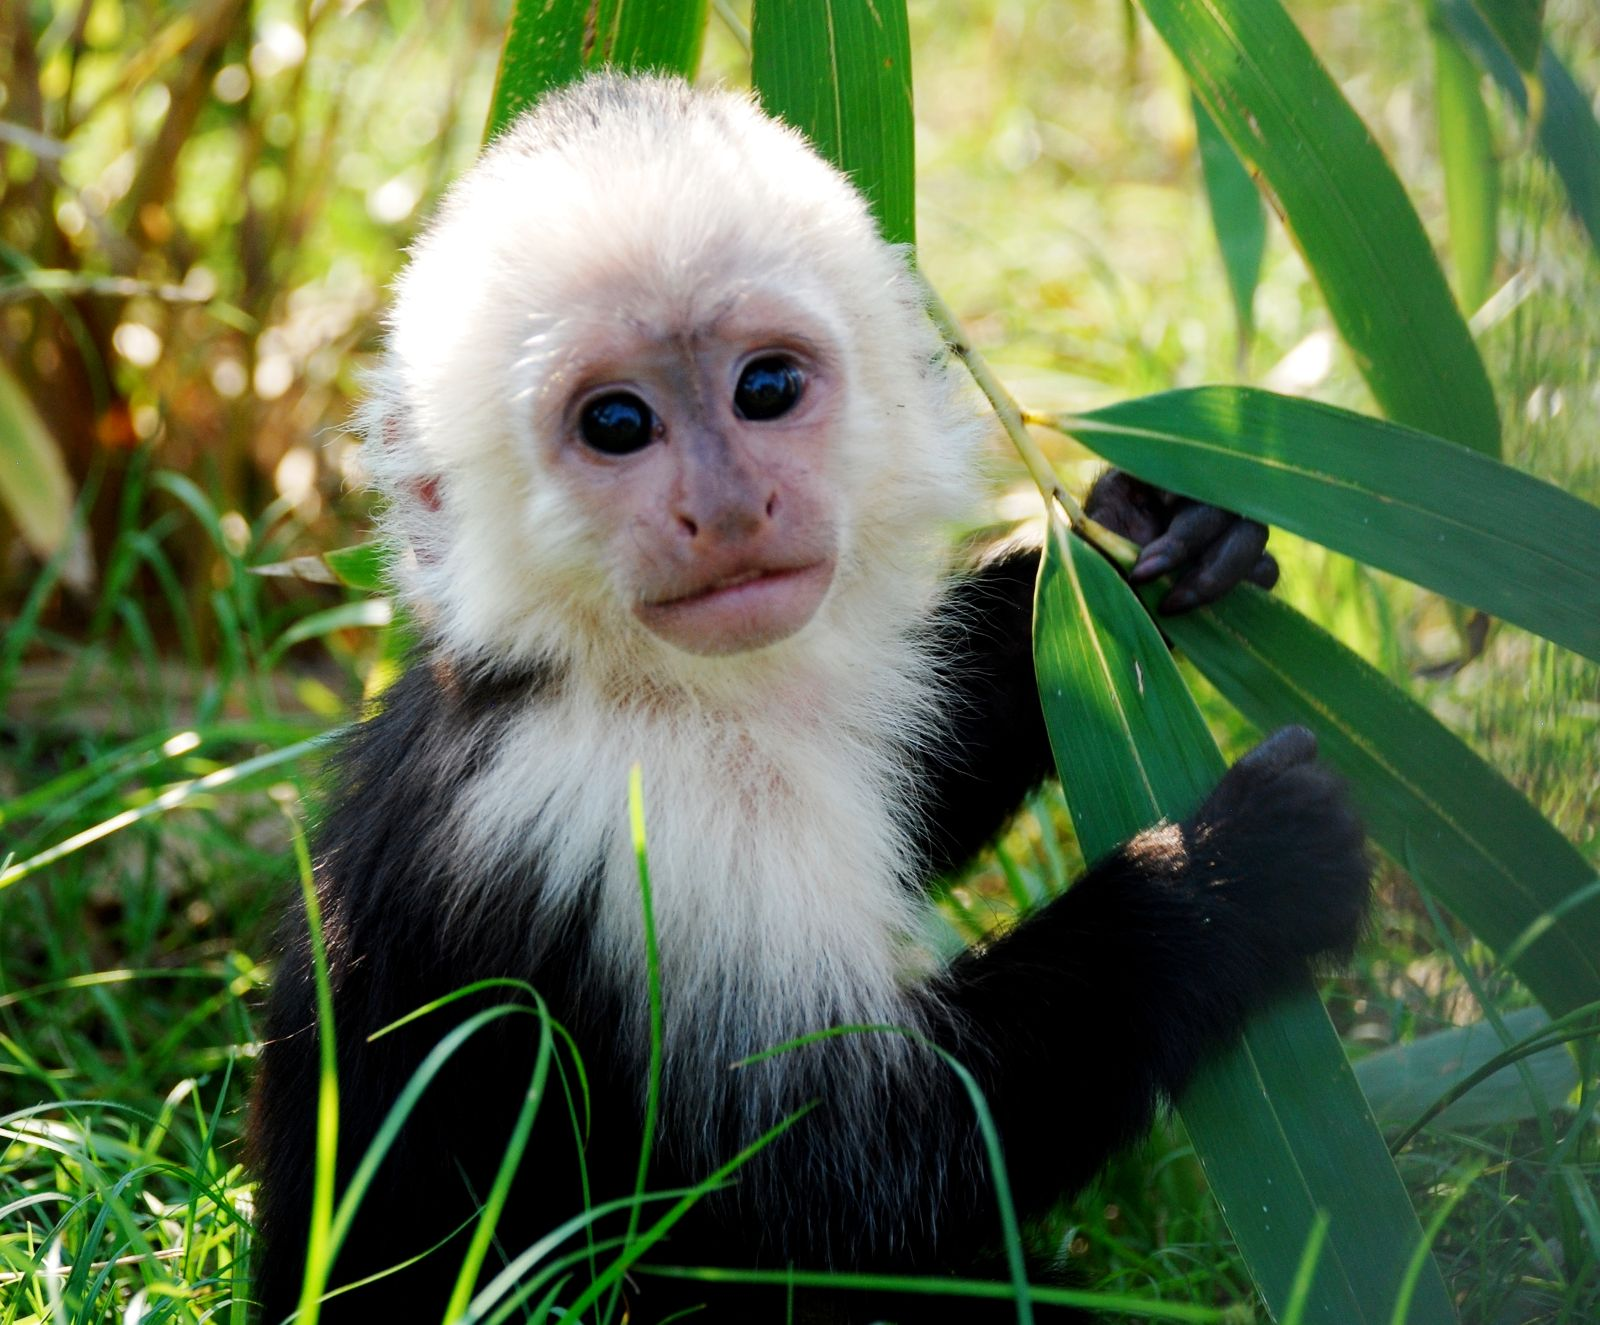 Jungle Friends Primate Sanctuary: JN-2011-12-27 Monkey ...